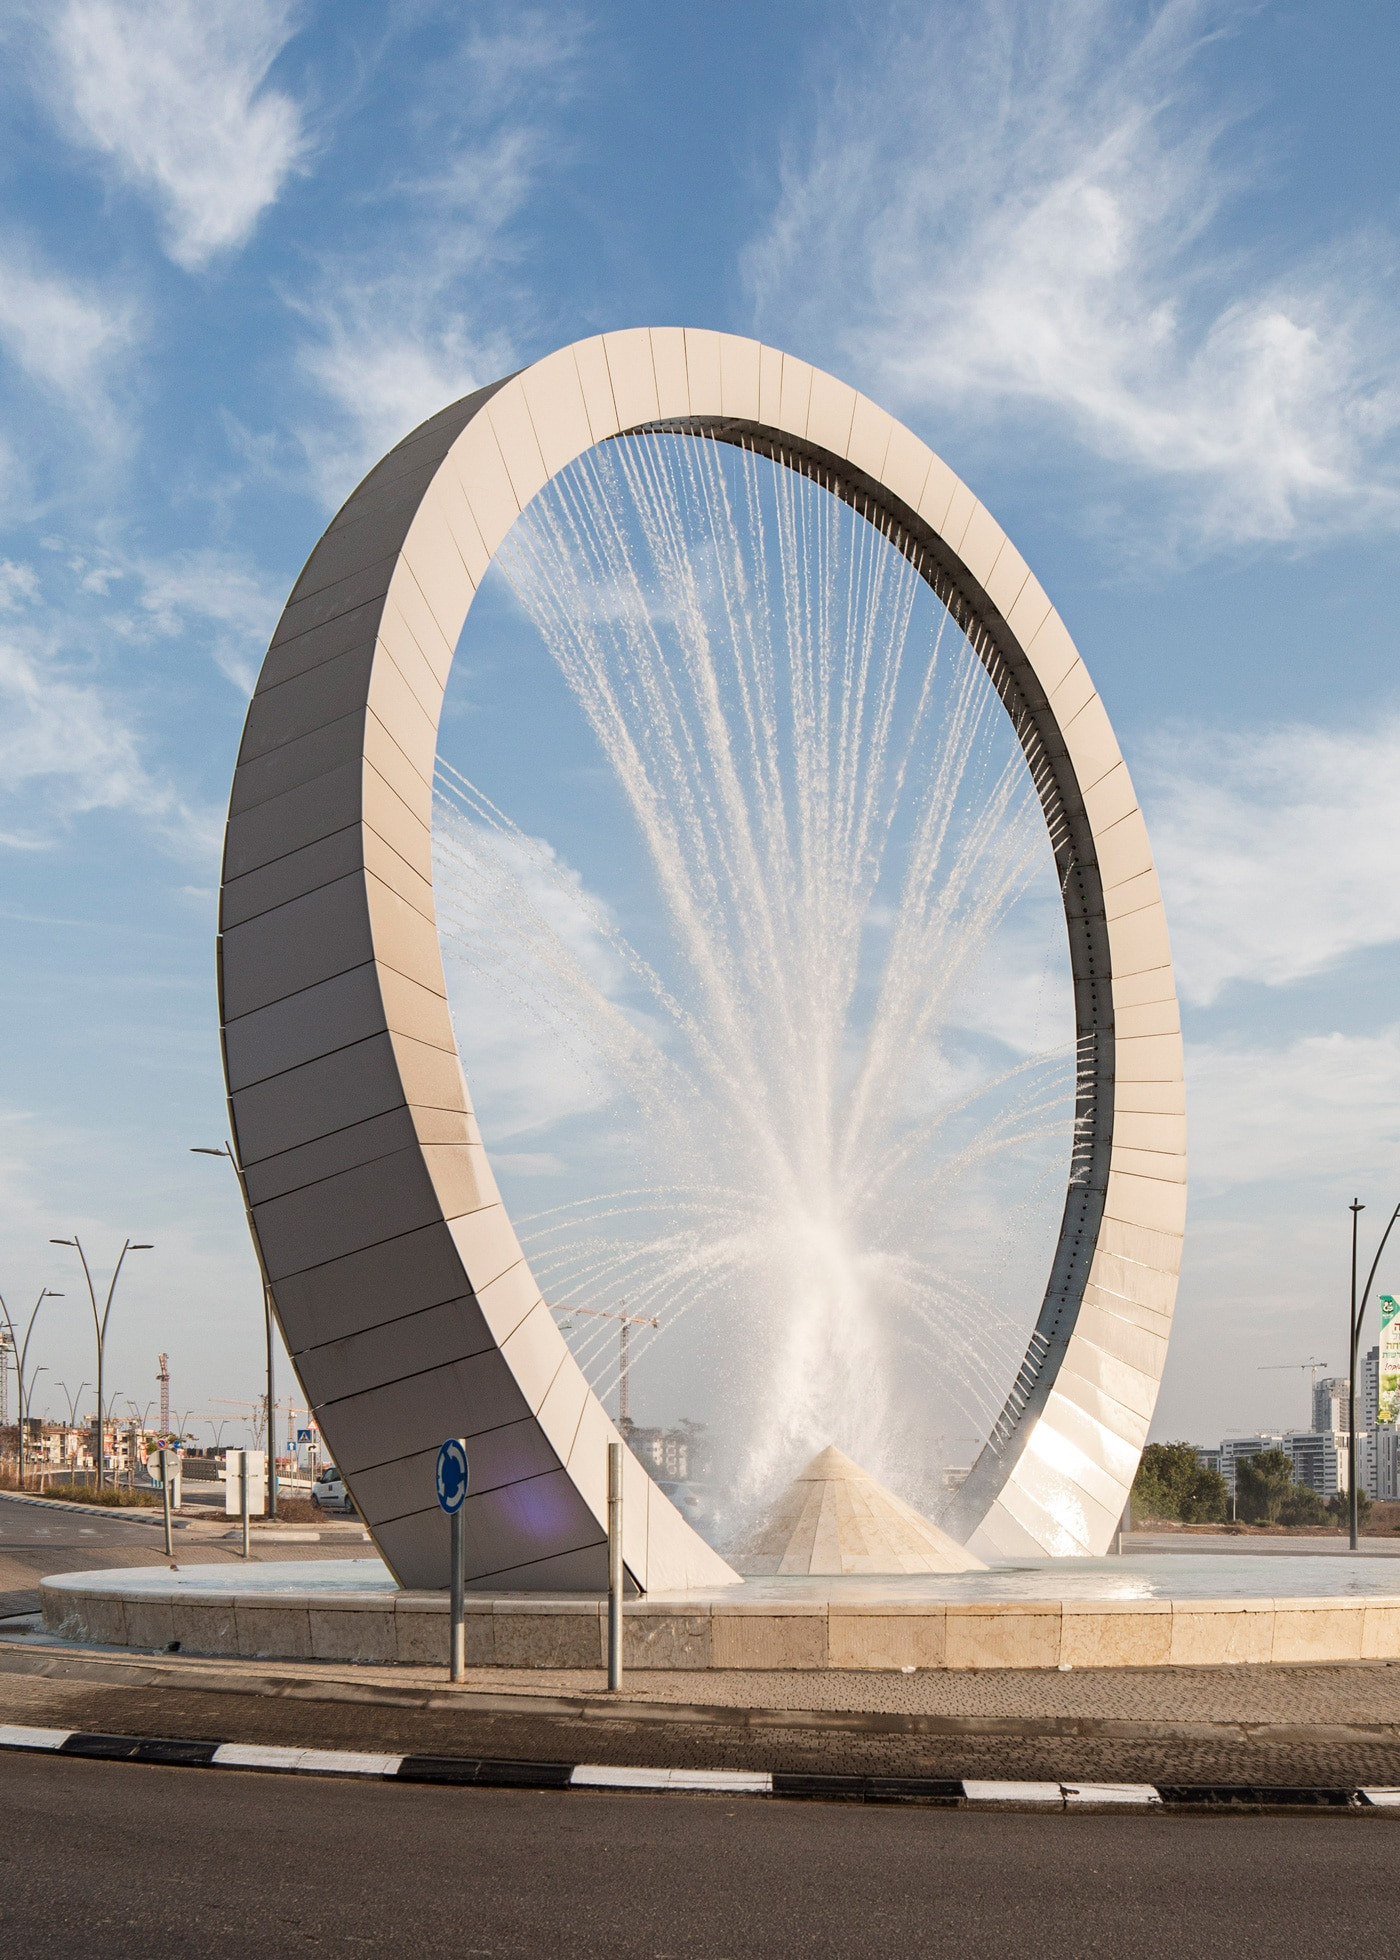 Kiryat Gat Water Fountain  - Nimrod Levy4 57